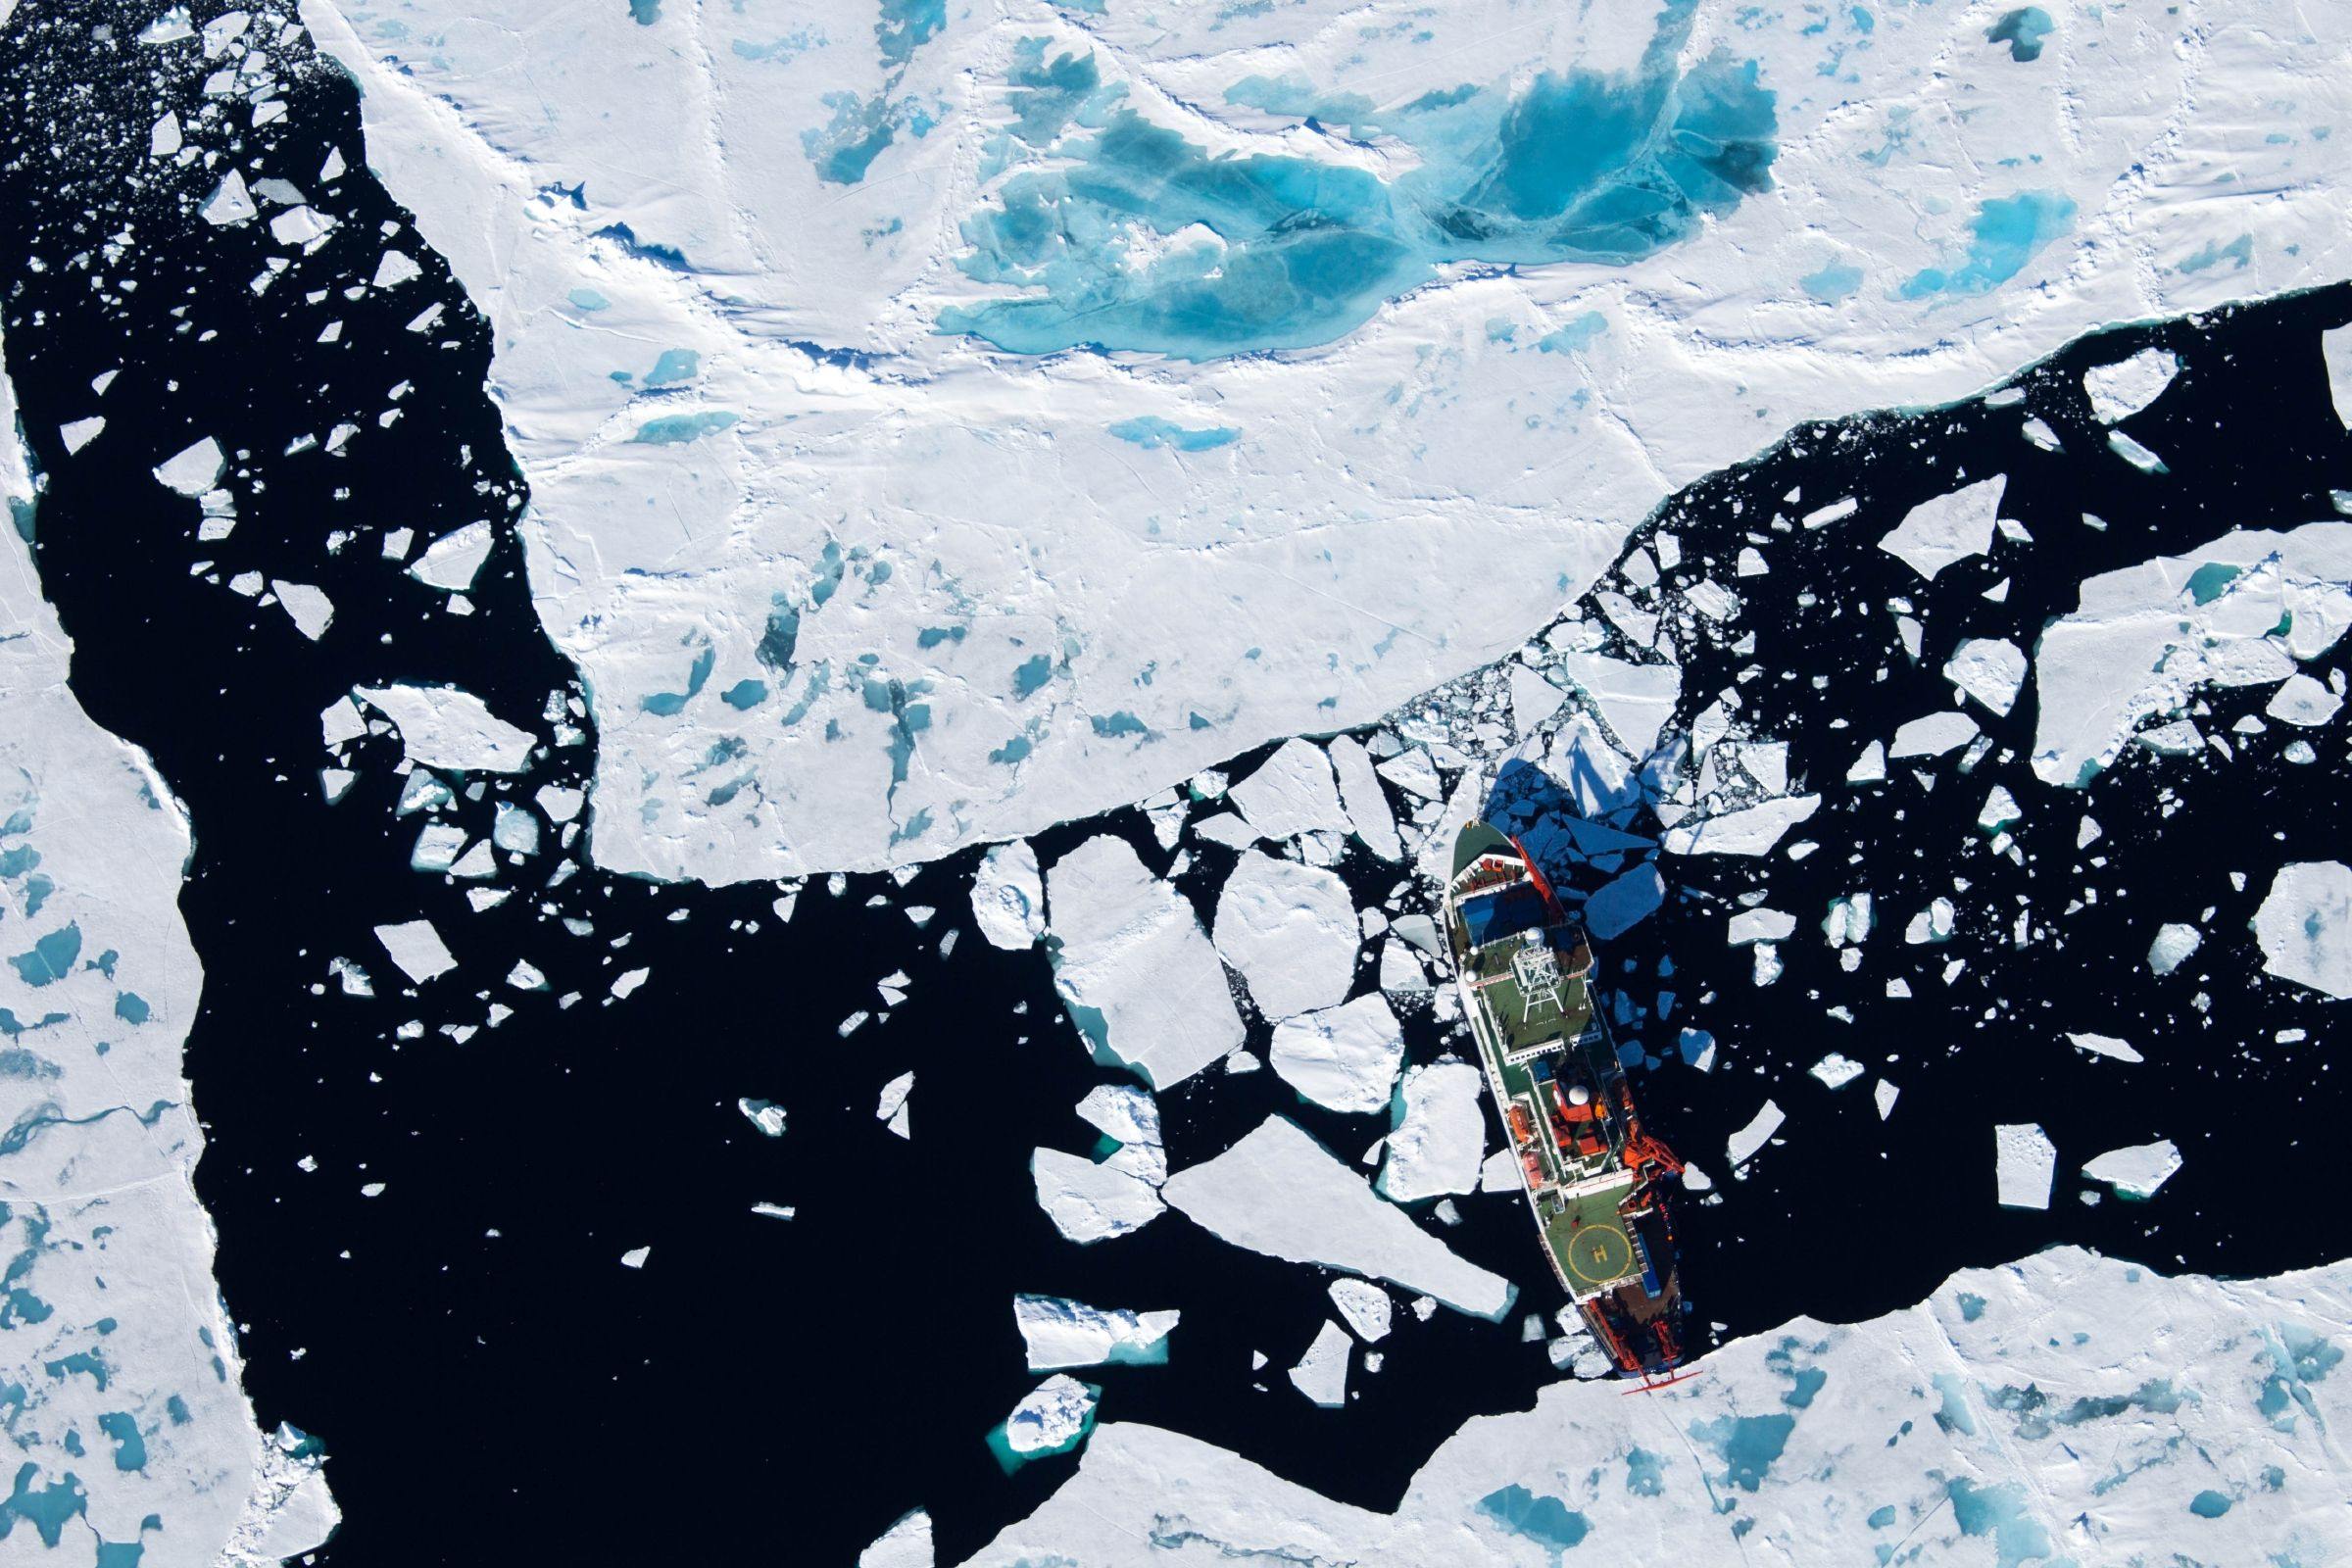 20140721_Polarstern86_Arktis_2014_Aurora_040_SArndt